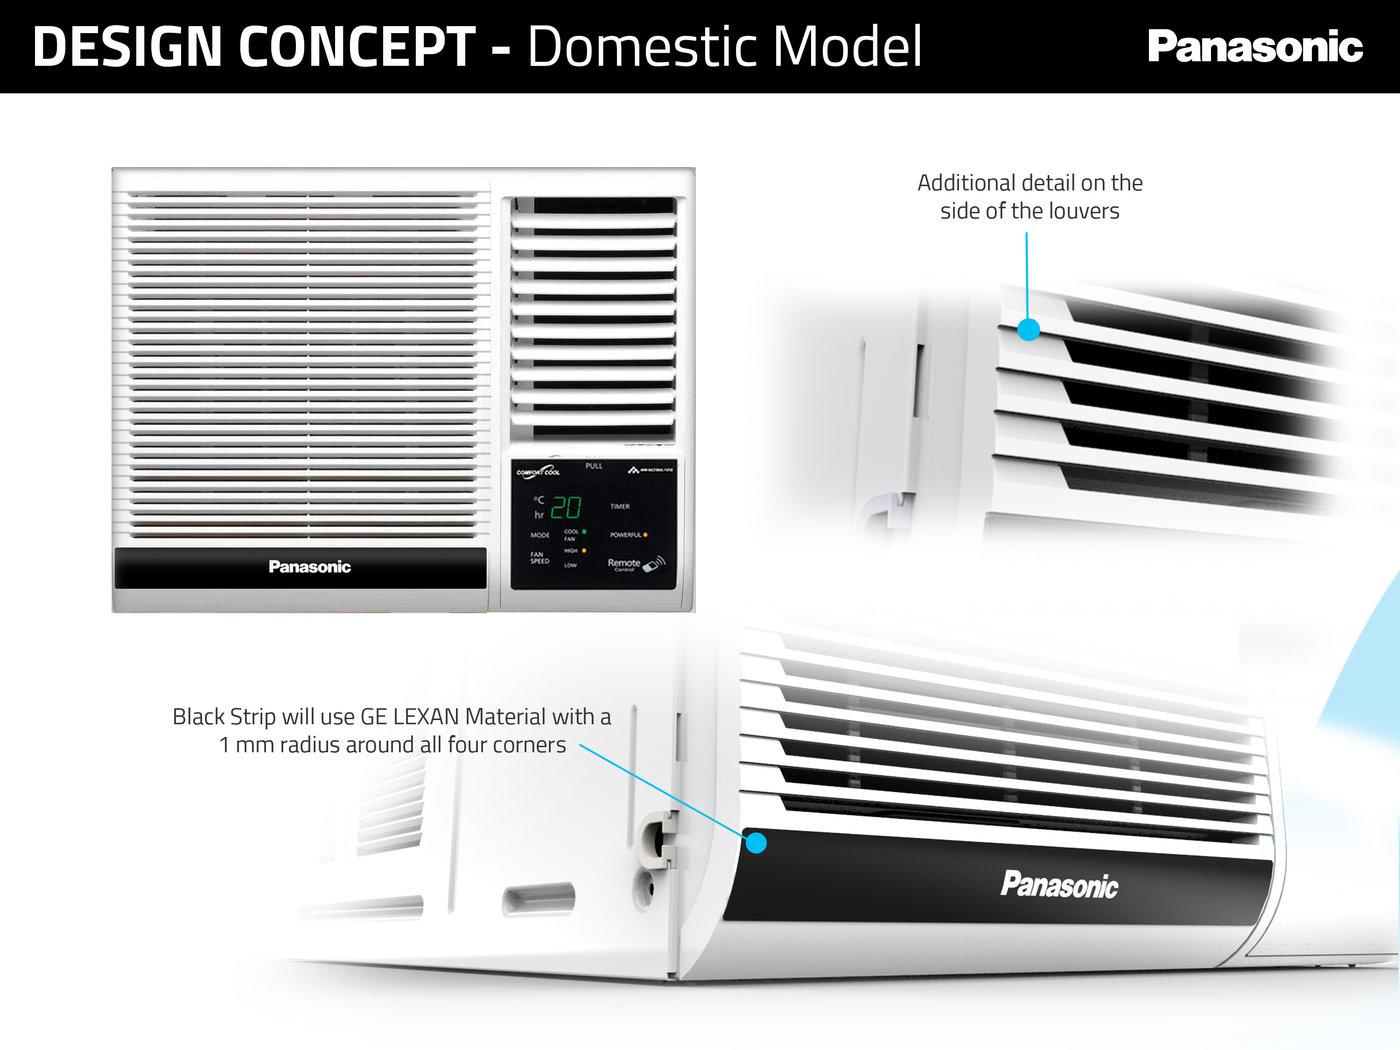 Panasonic Window Air Conditioner By Nicole Varona At